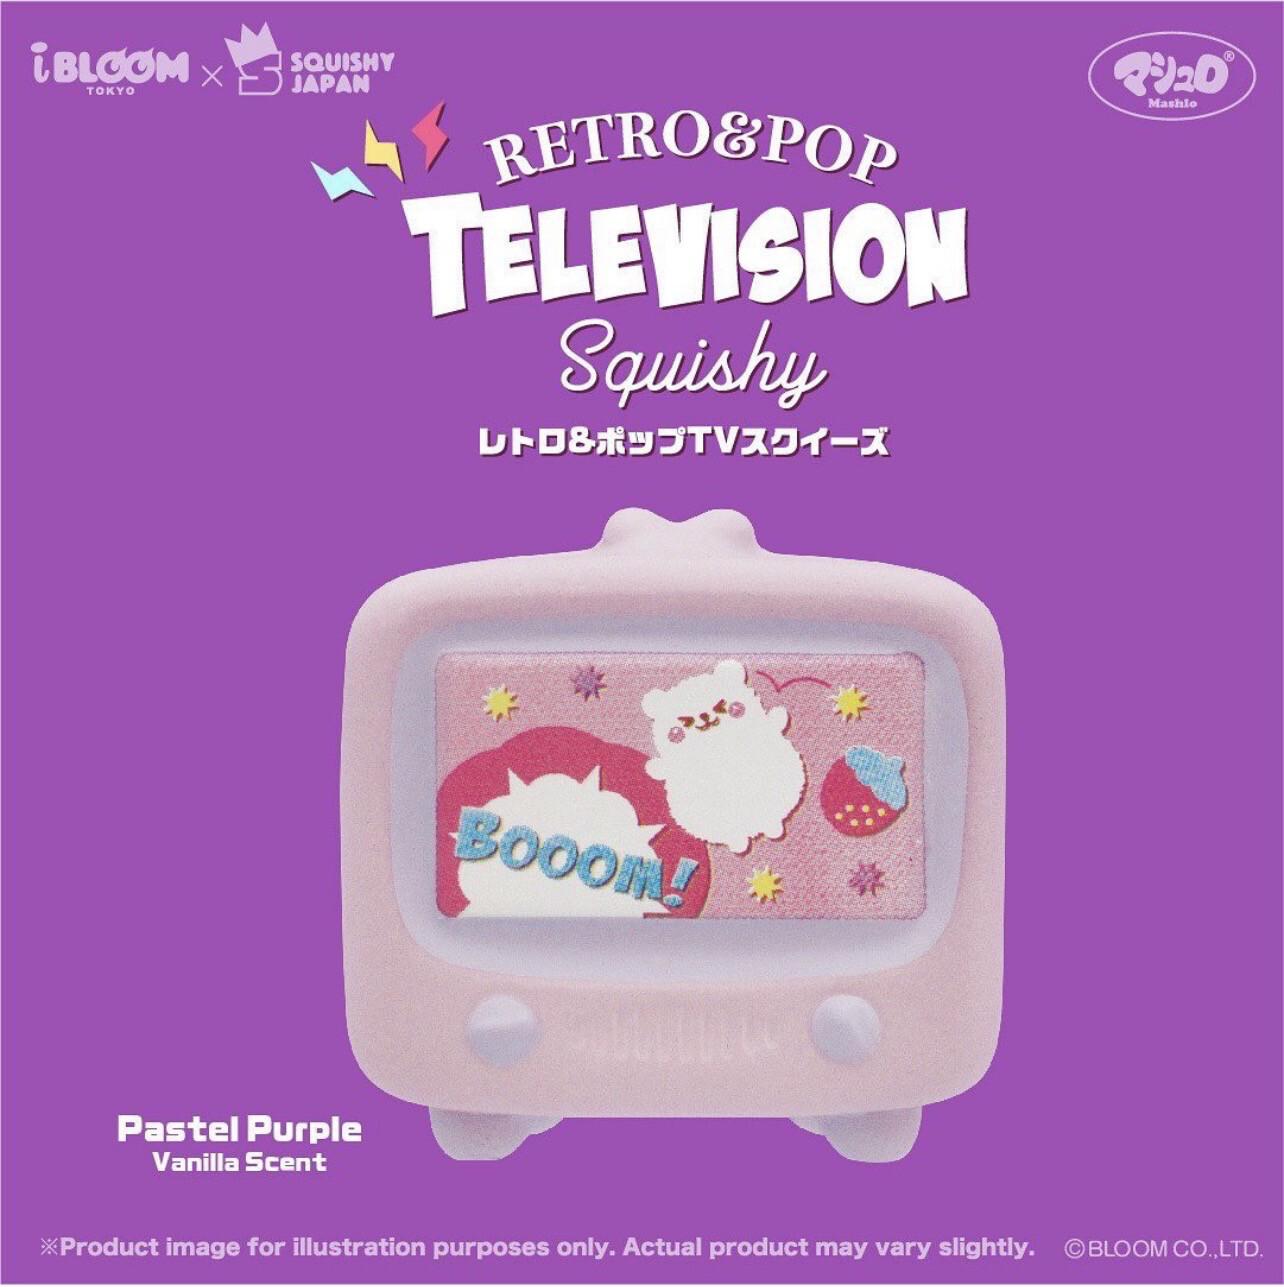 iBloom Retro & Pop Marmo Television Squishy Limited Edition